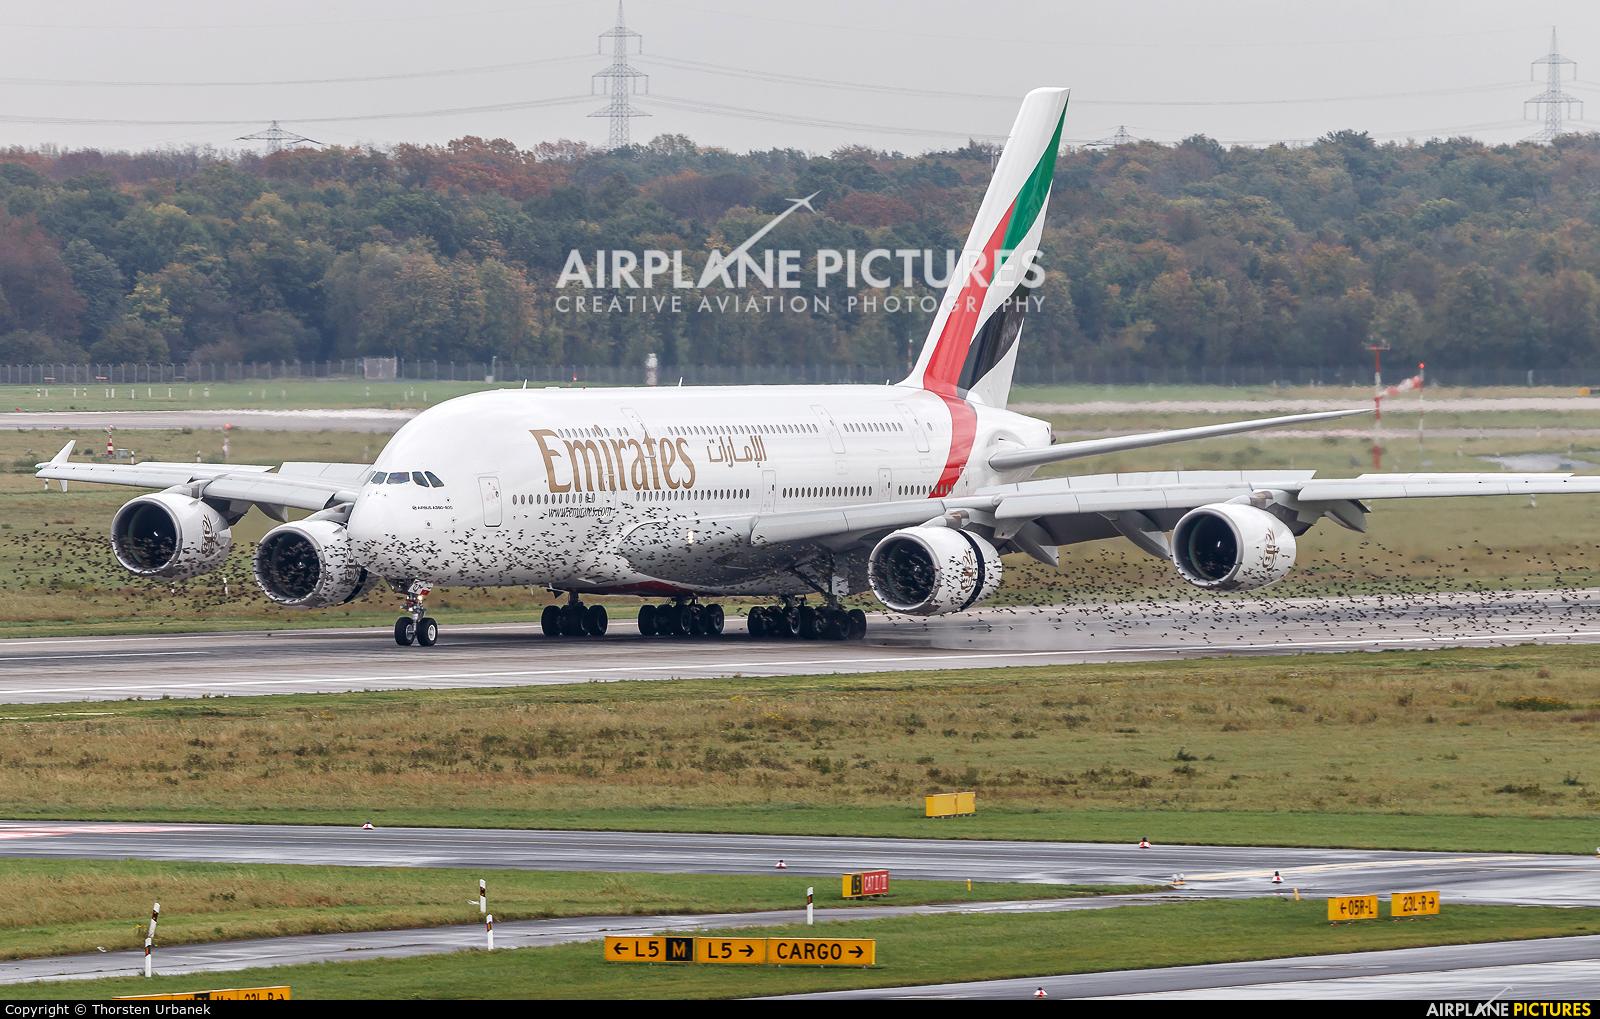 Emirates Airlines A6-EOT aircraft at Düsseldorf